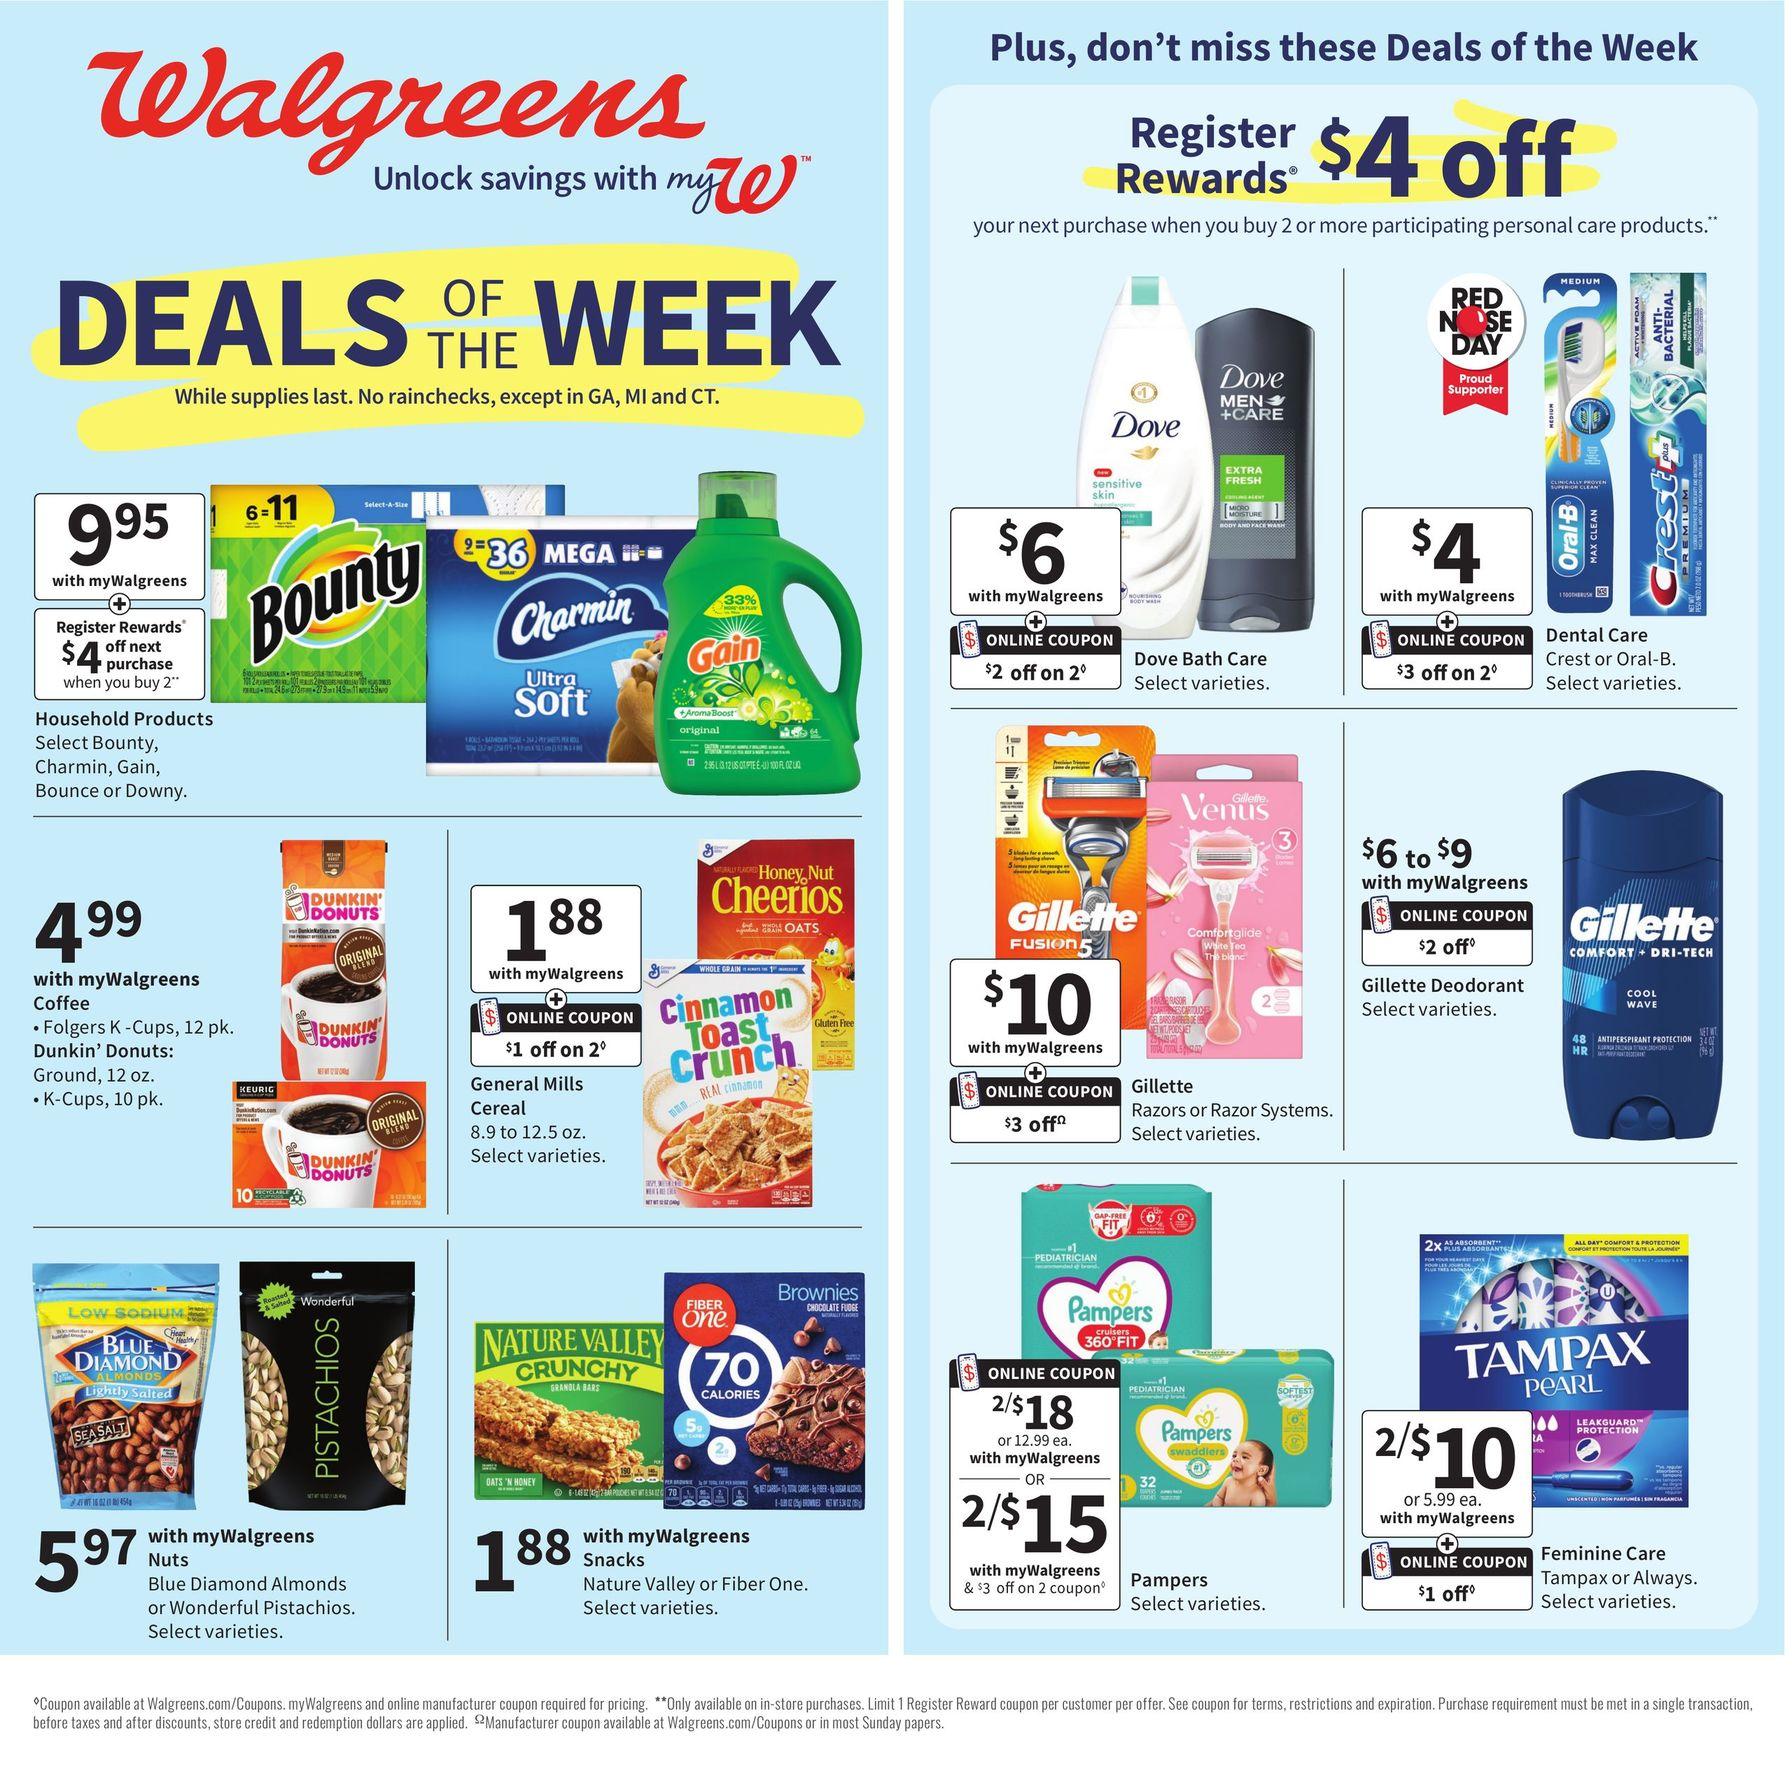 Walgreens Weekly Ad Sale April 11 - April 17, 2021